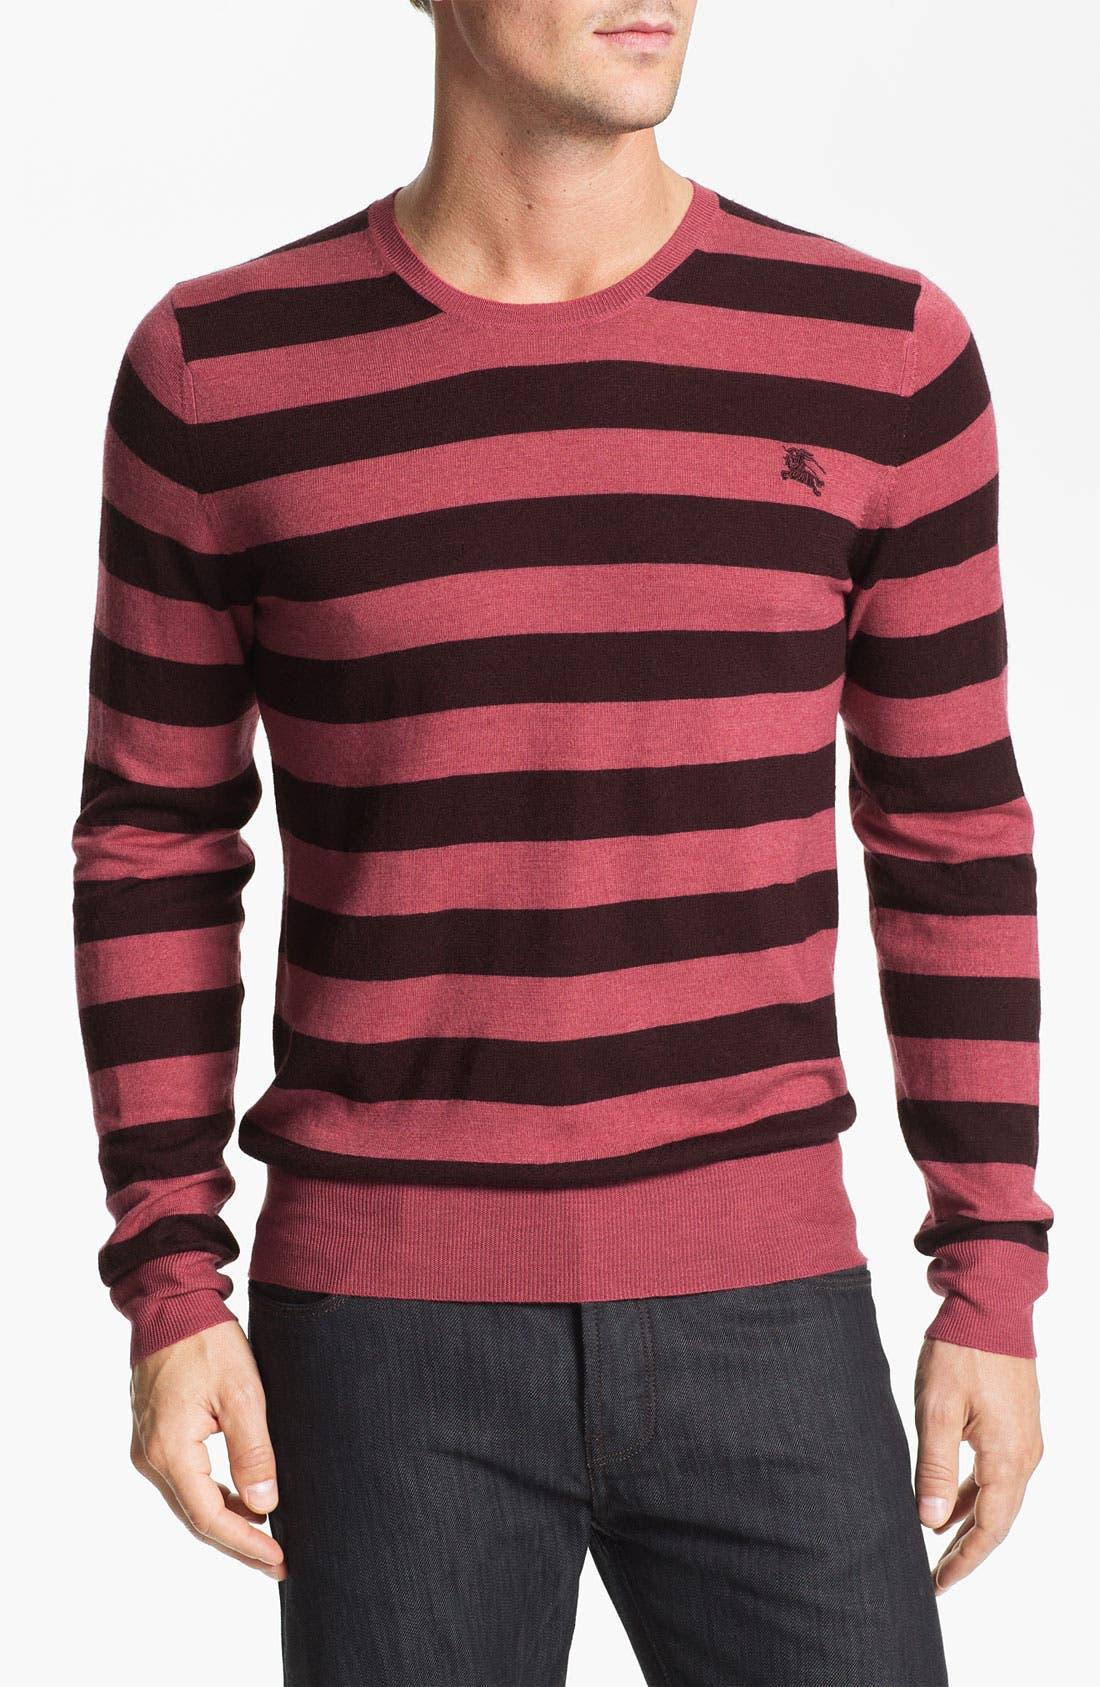 Alternate Image 1 Selected - Burberry Brit 'Peyton' Lightweight Merino Wool Sweater